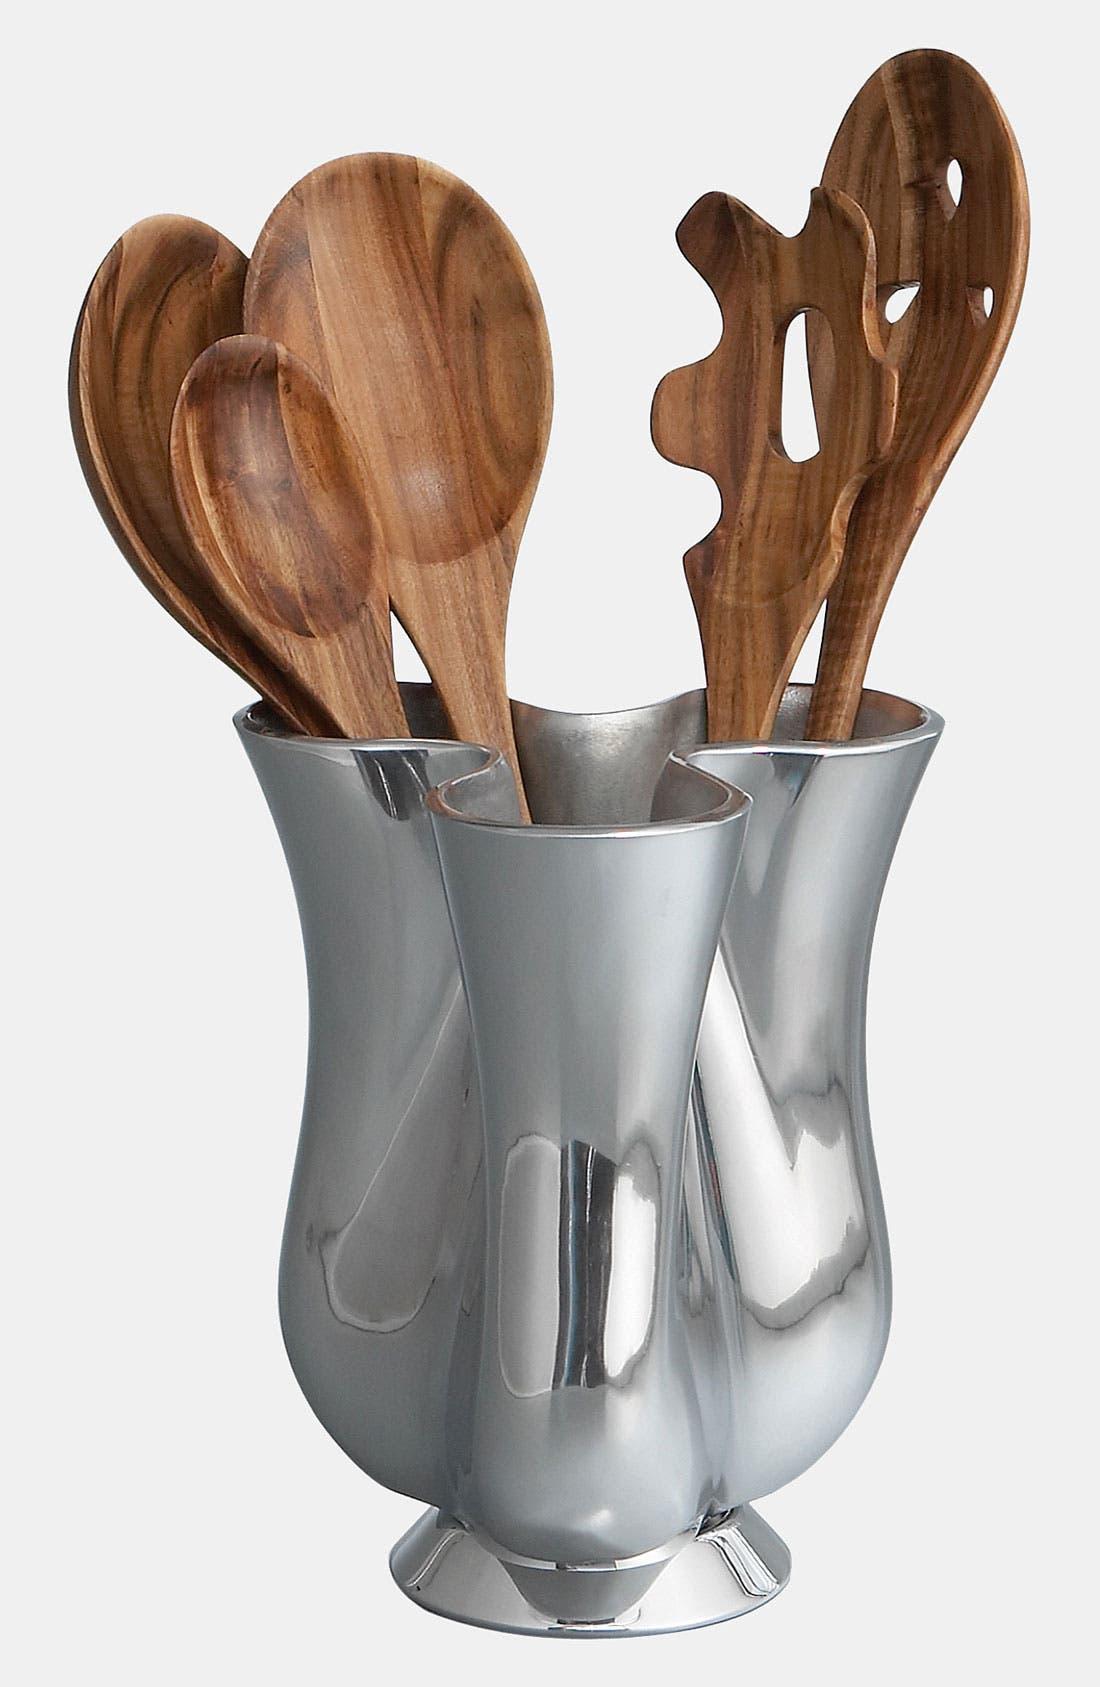 Tulip 6-Piece Kitchen Tool & Jug Set,                             Main thumbnail 1, color,                             NO COLOR